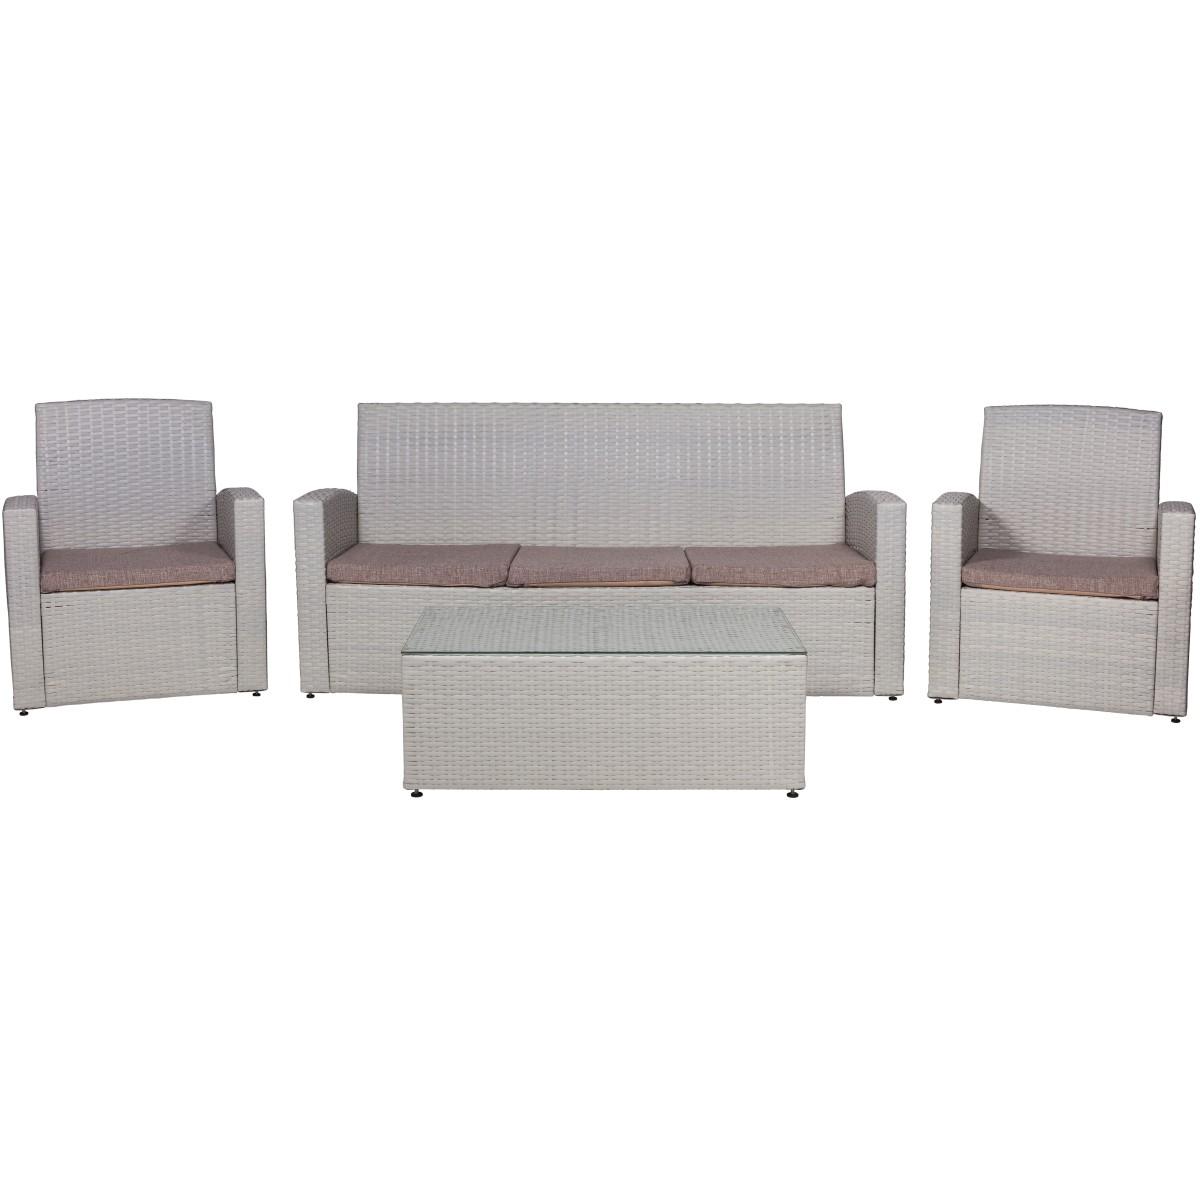 Набор мебели Тунис цвет бежевый